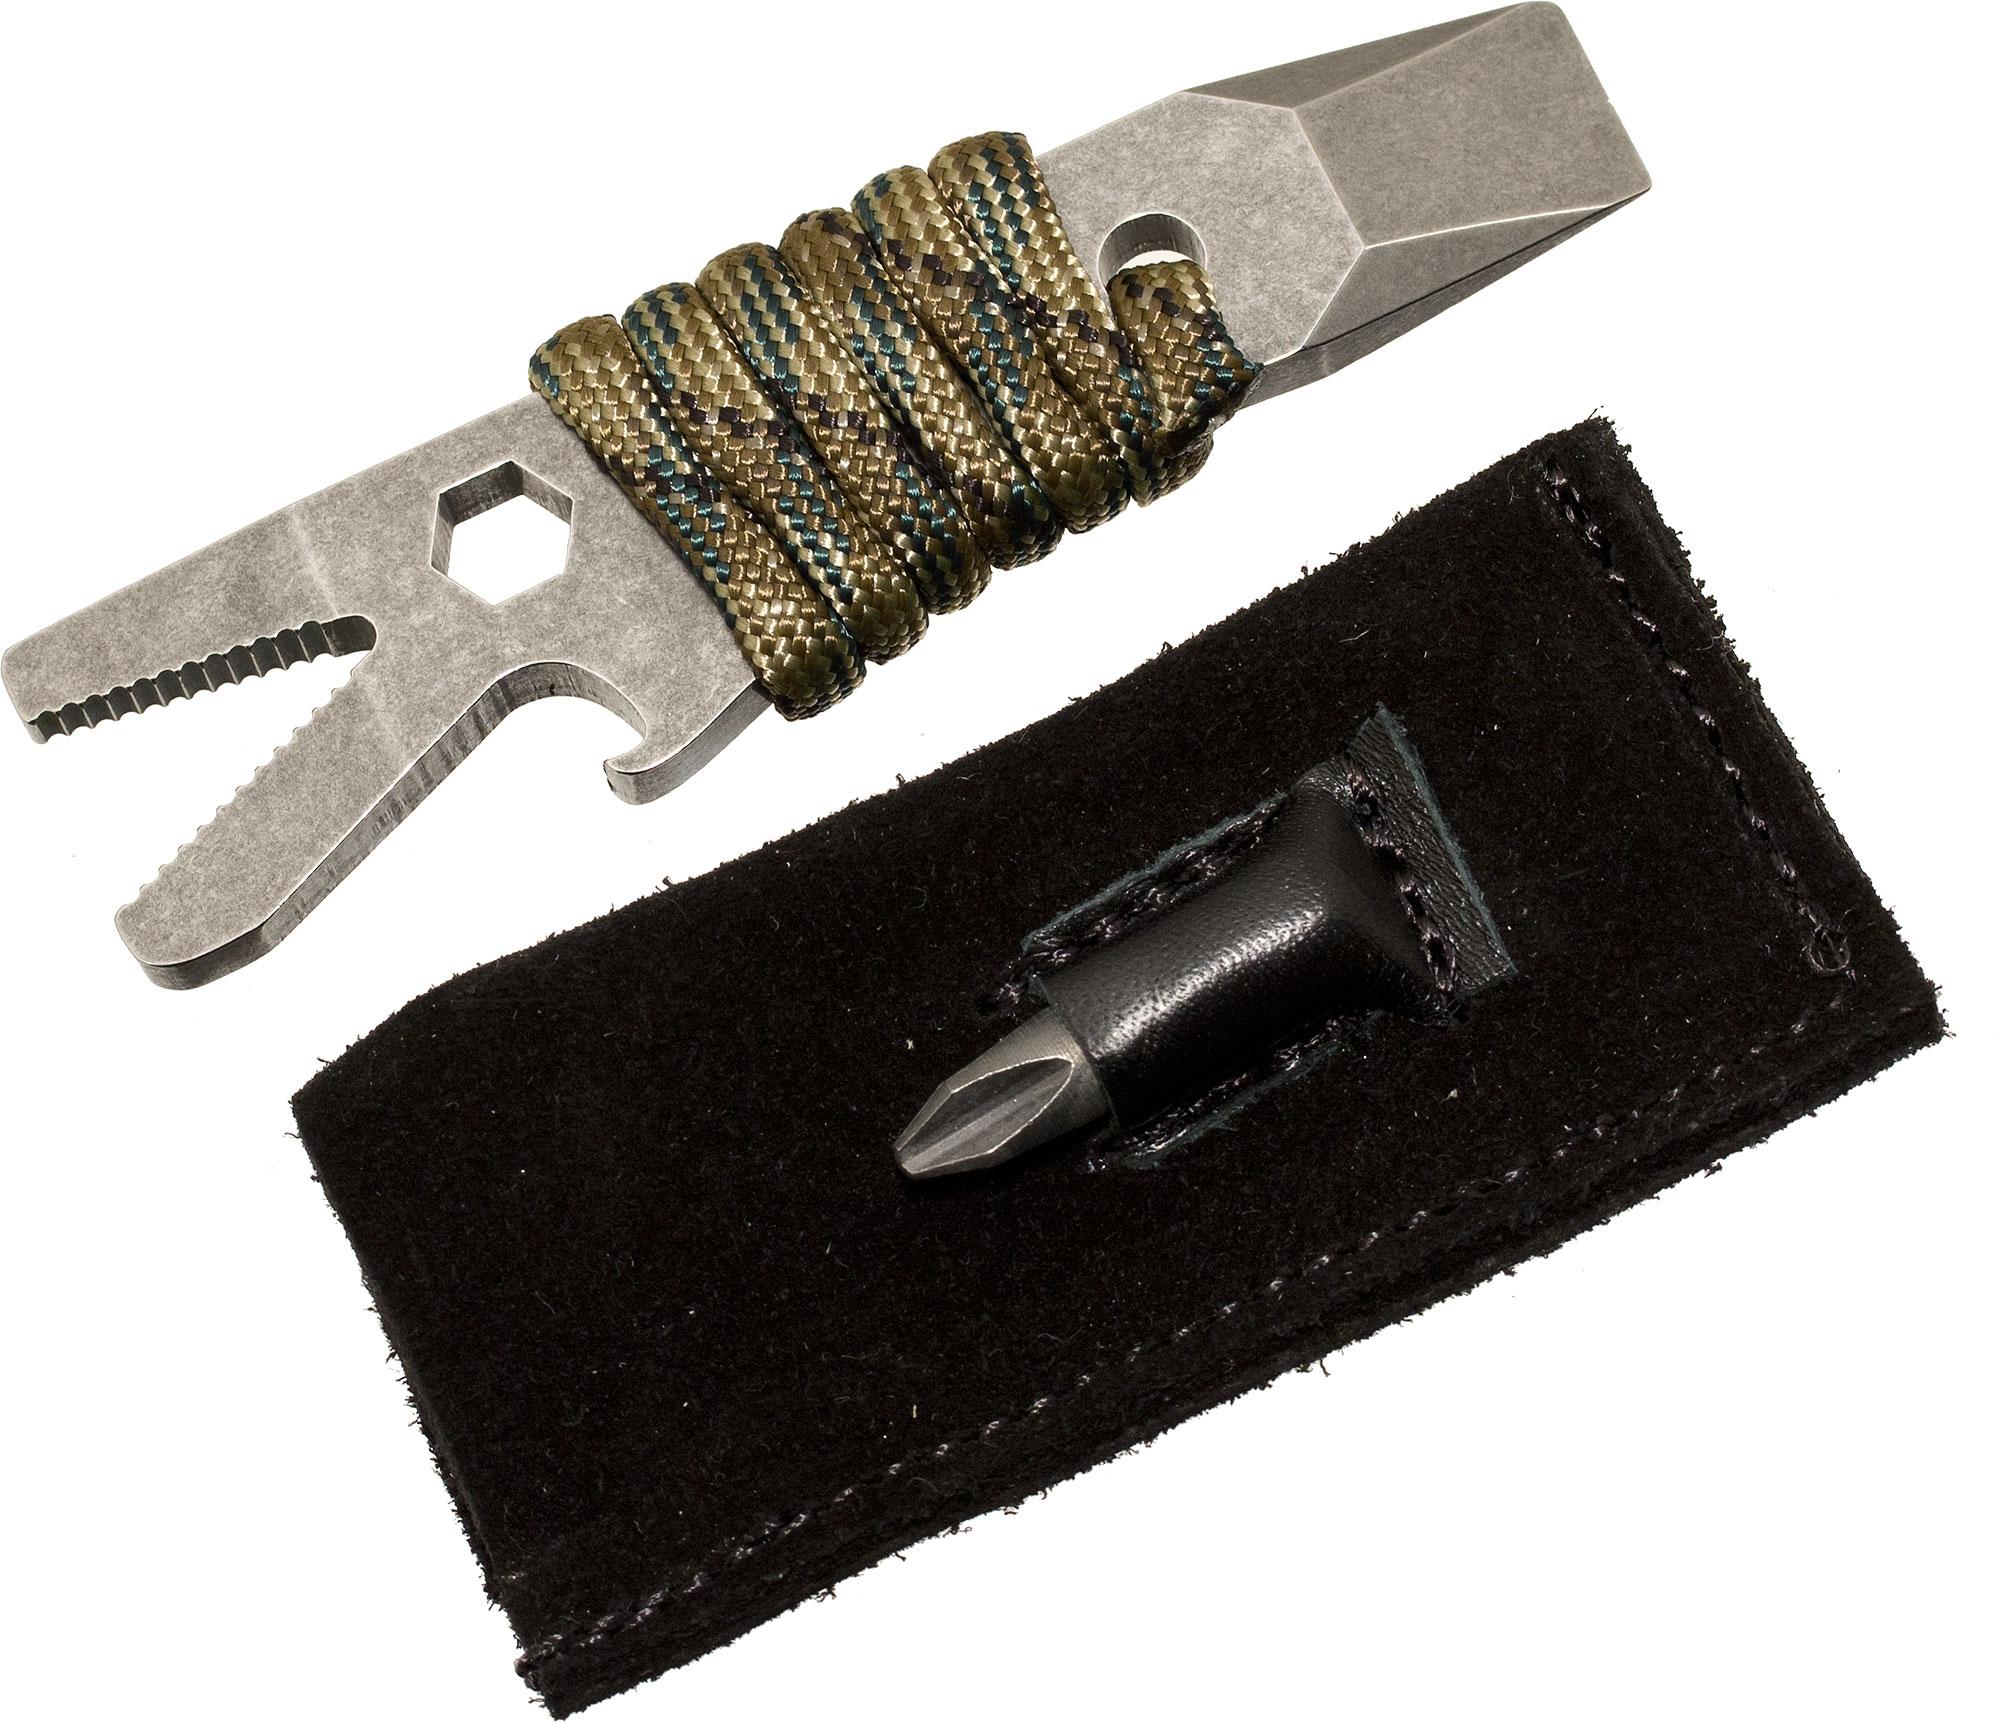 Maserin 905/FF Pocket Tool Crocodile Multifunctional Pry Tool with Sheath